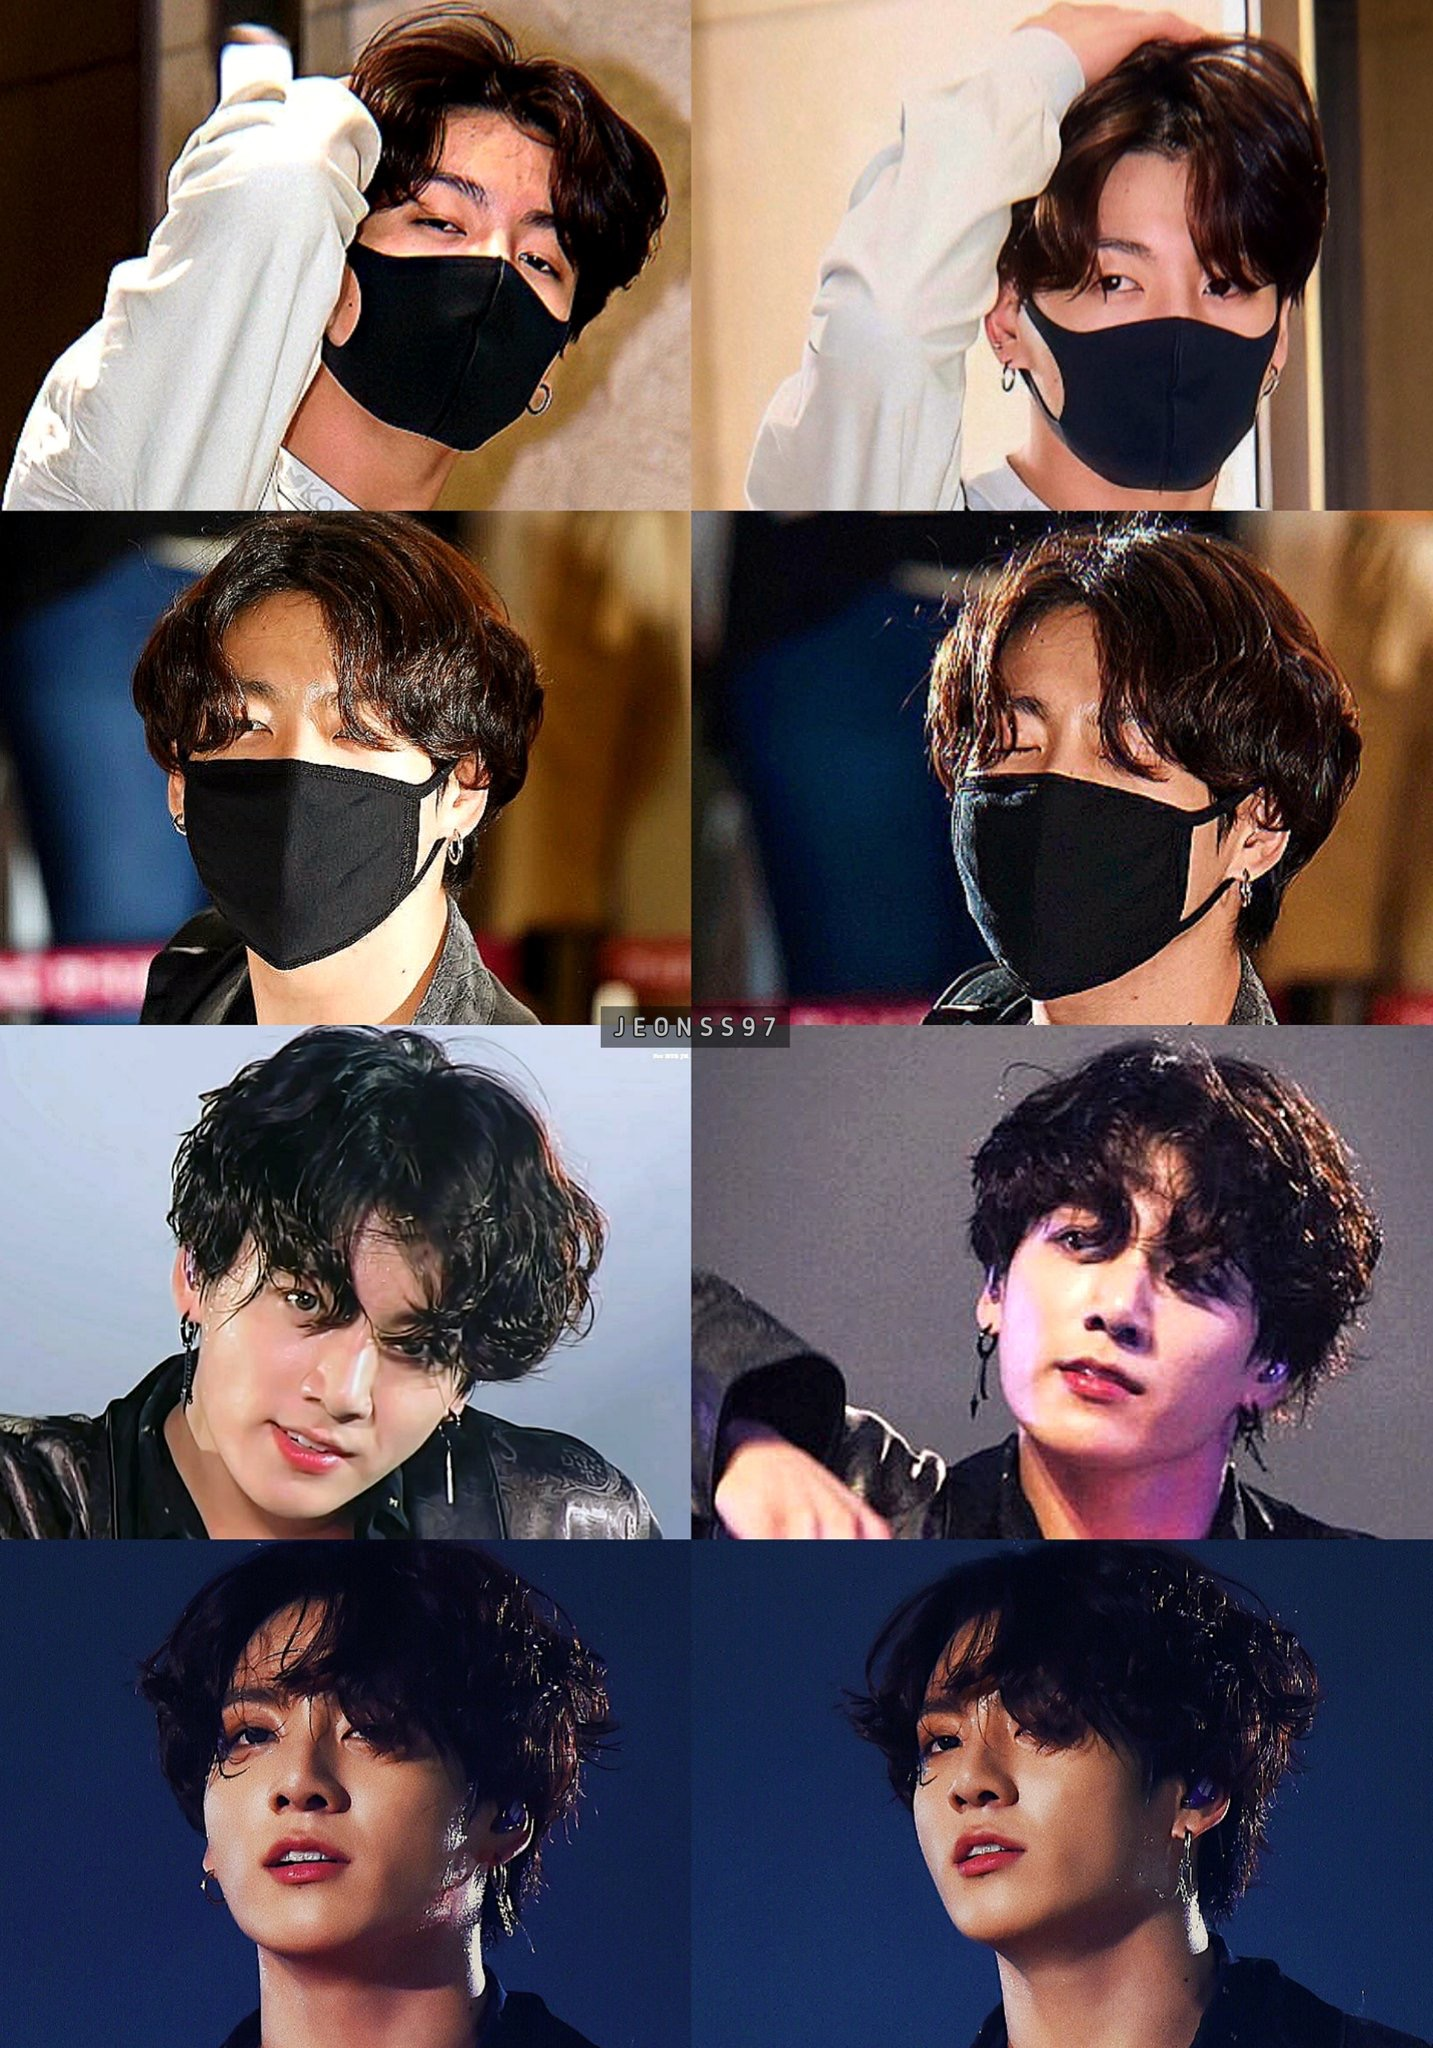 9 Potret gaya rambut baru Jungkook BTS, bikin fans makin jatuh hati